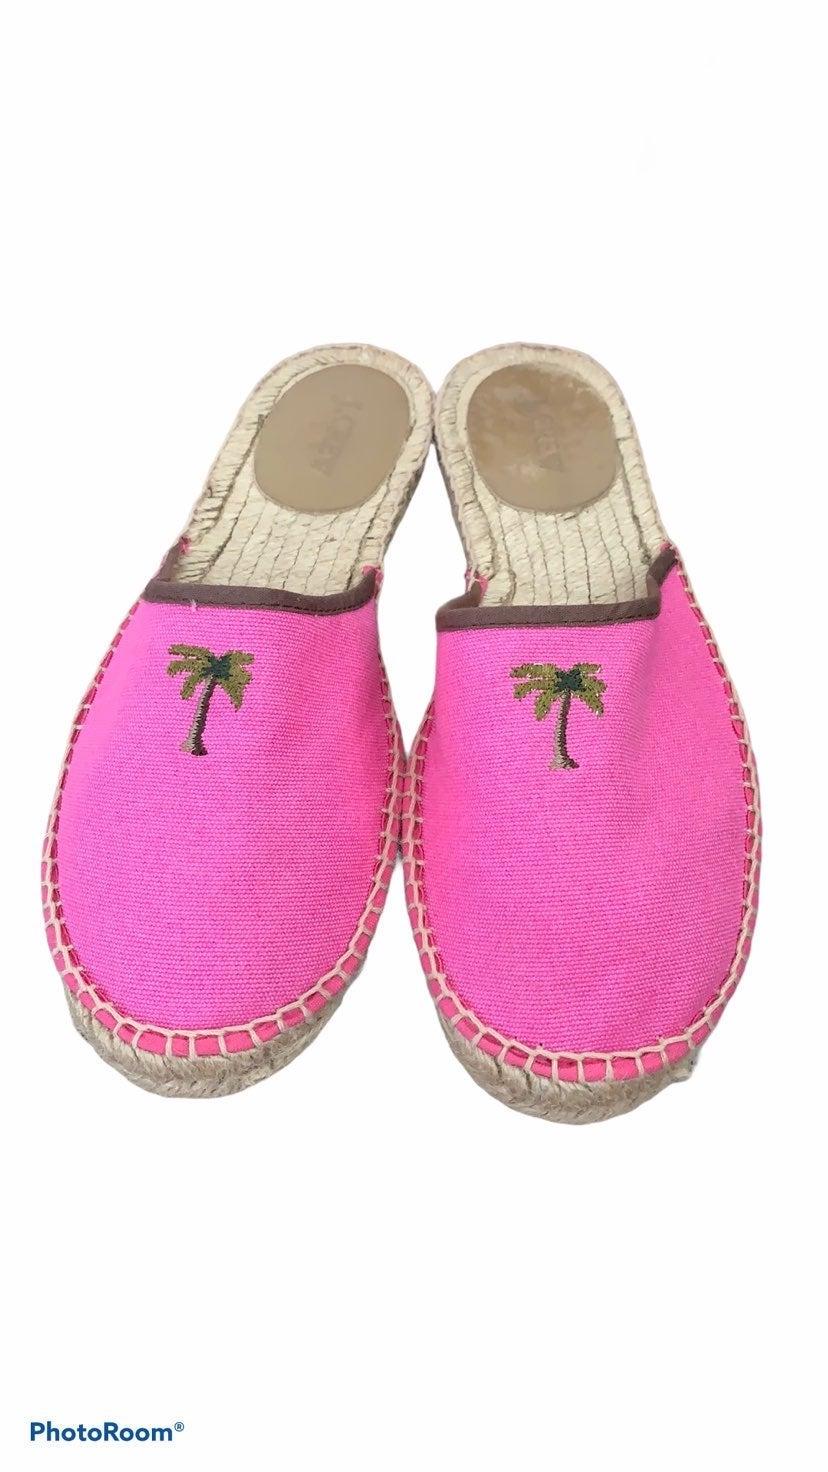 J Crew Pink Palm Tree Espadrille Mules